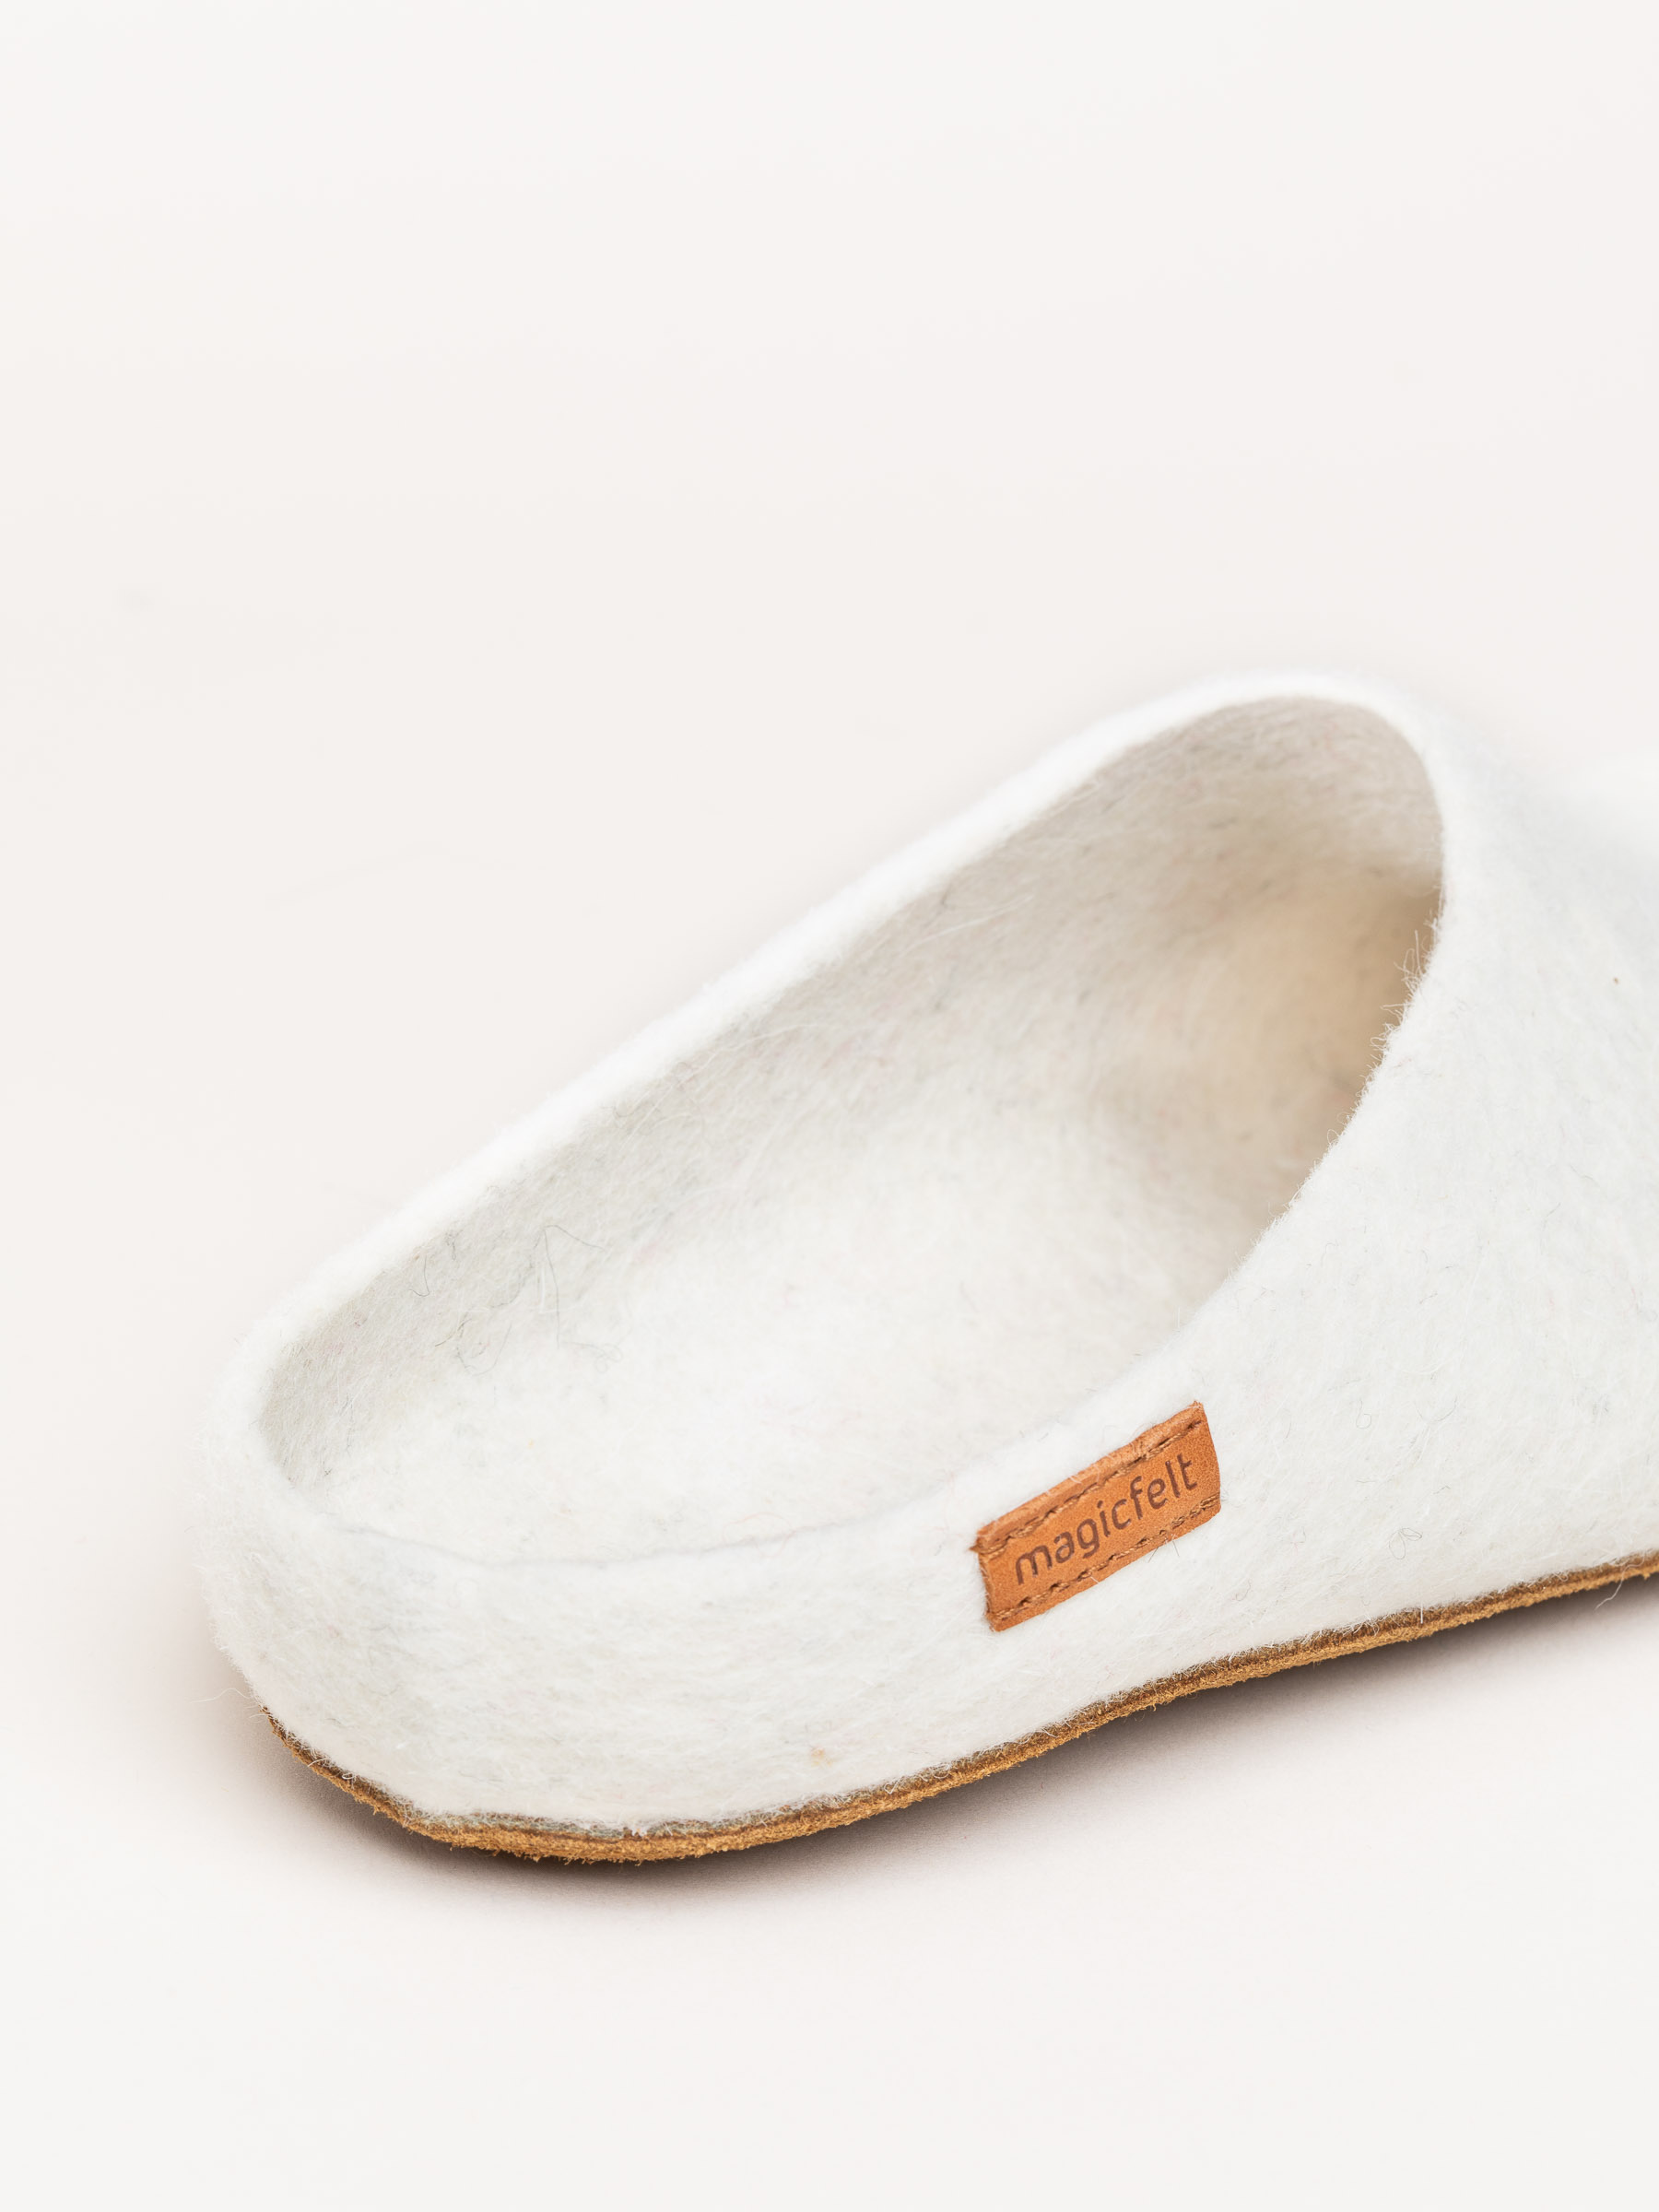 AR 713 Rare Wools Sliper